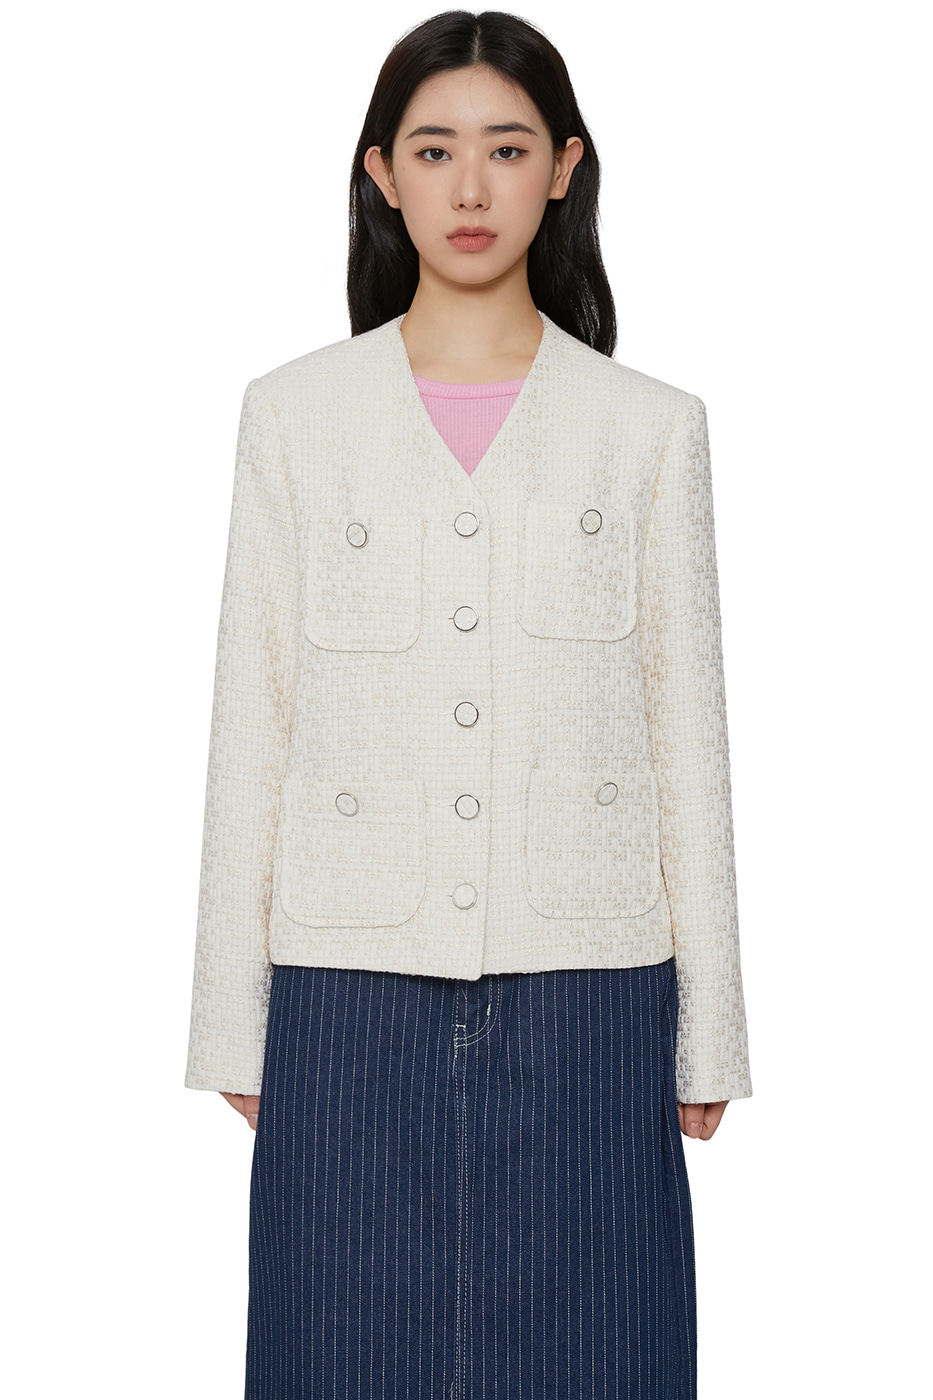 Remy Cararis tweed jacket